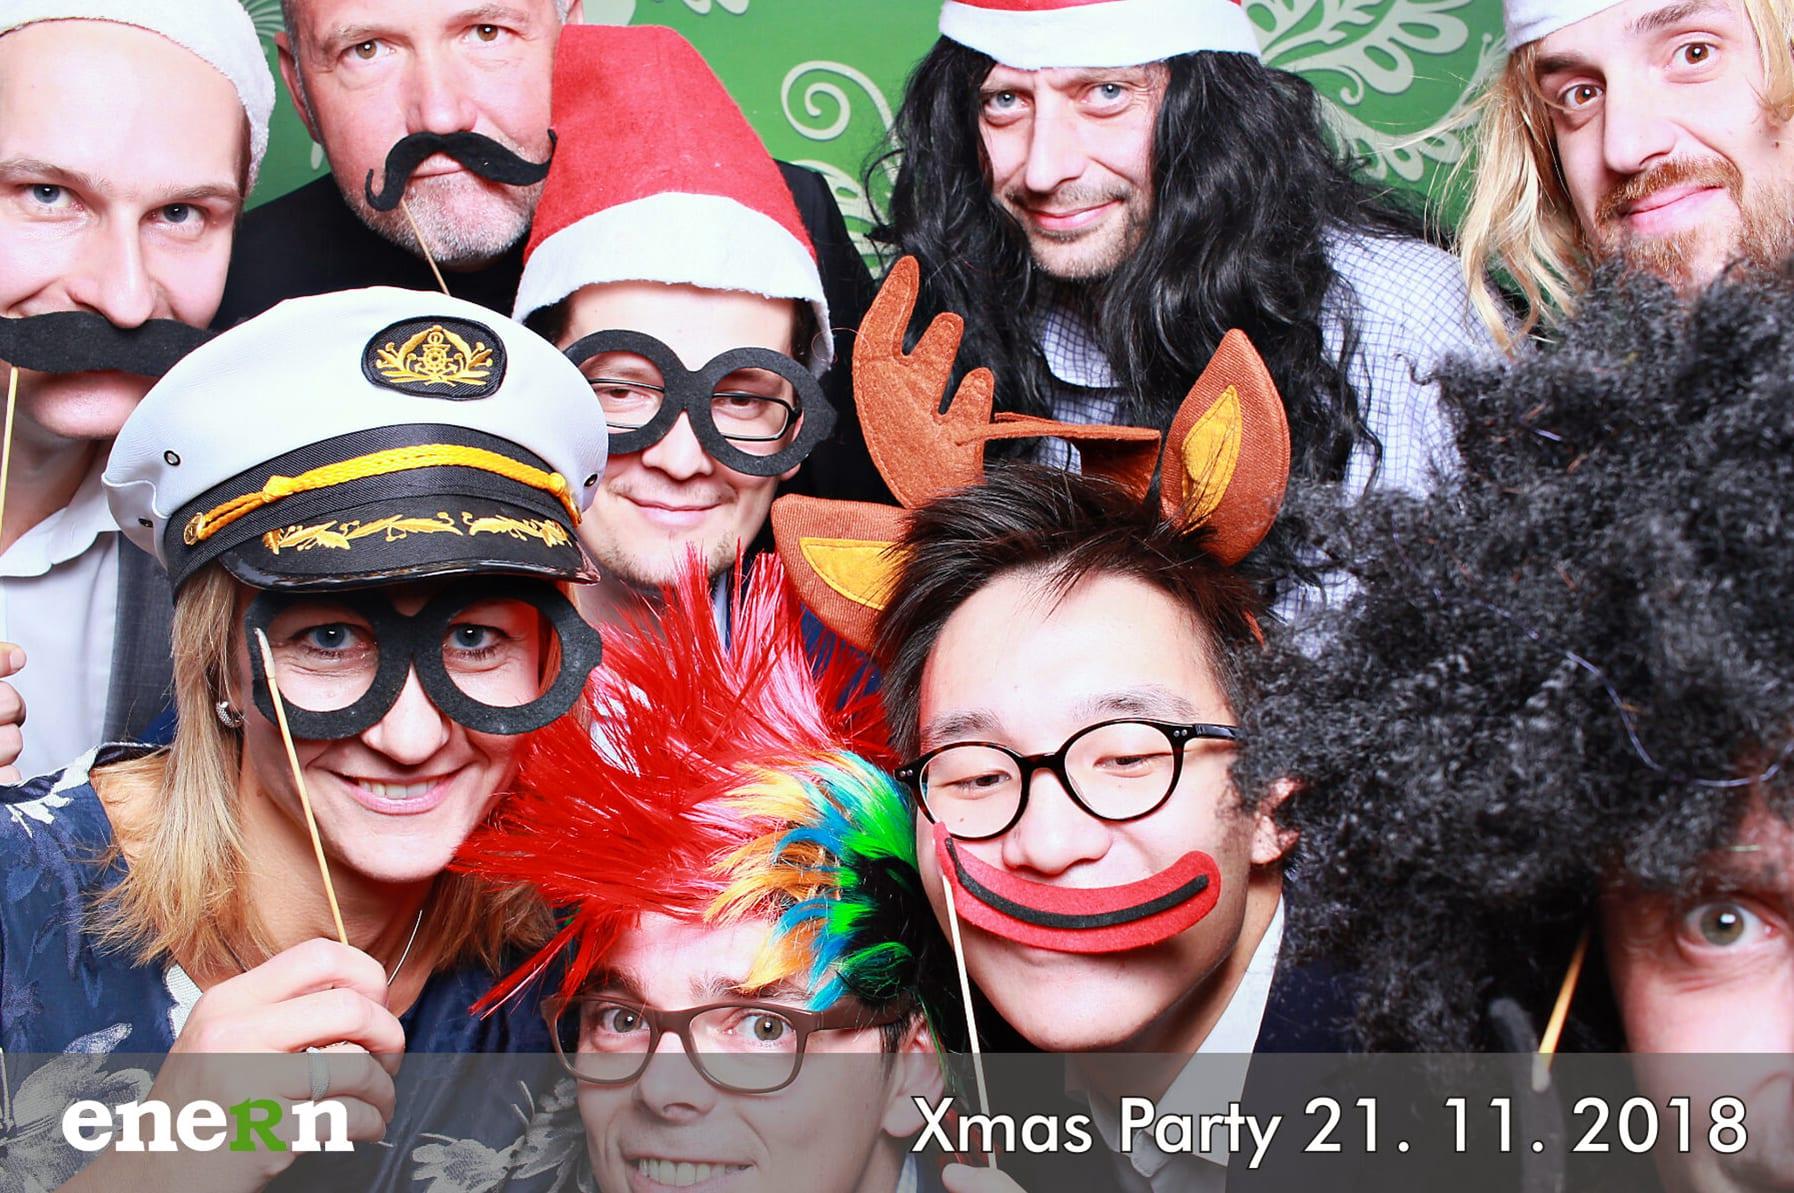 fotokoutek-enern-xmas-party-21-11-2018-523928